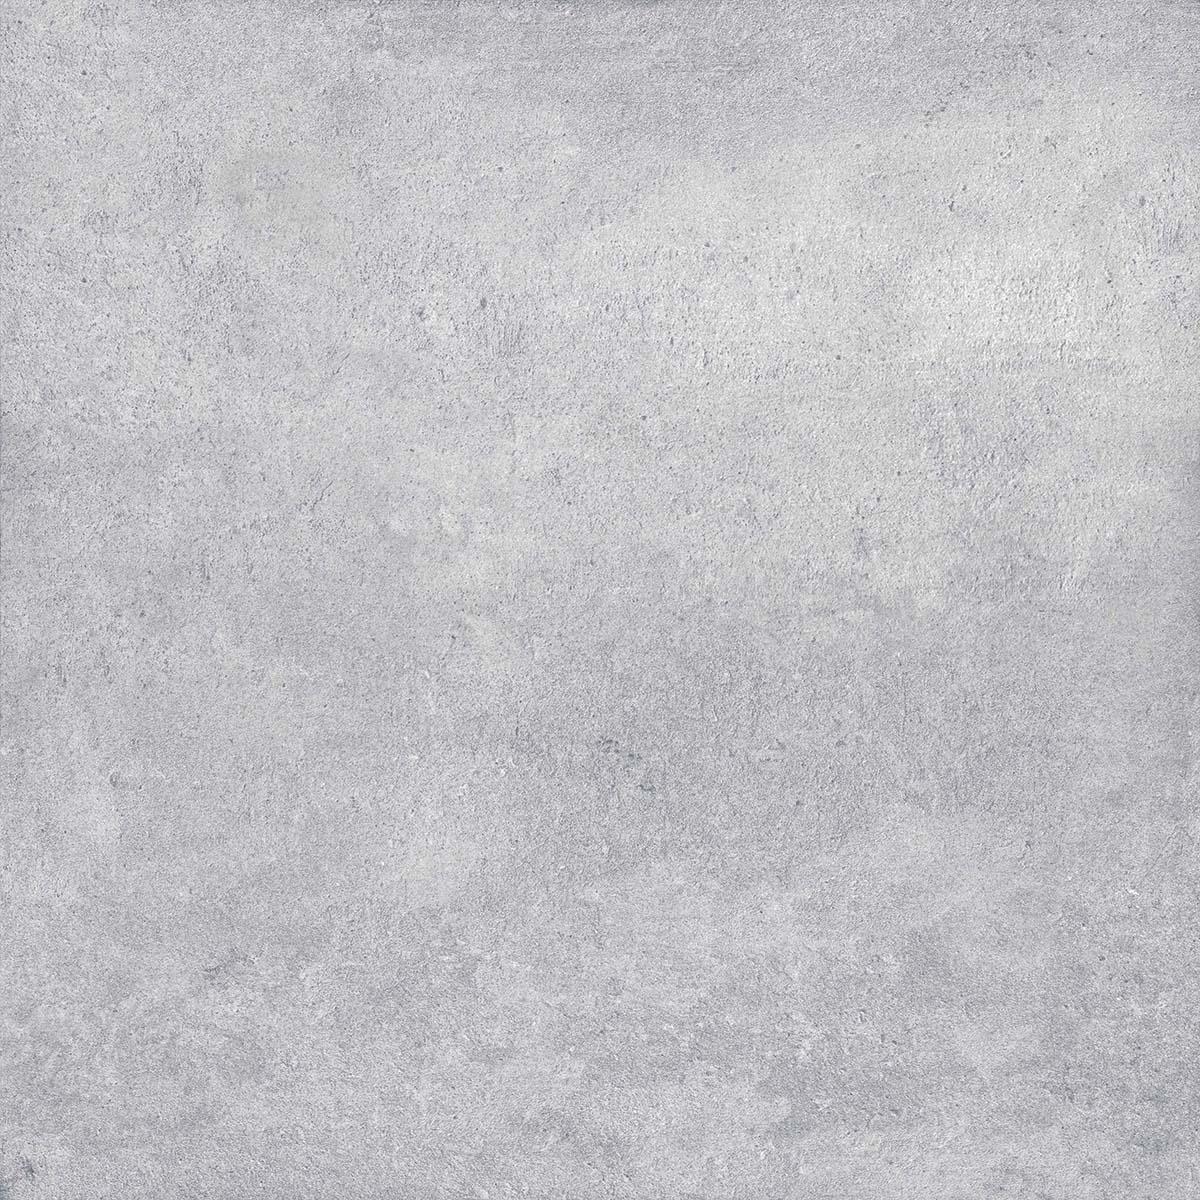 SLIMBOY grey Image